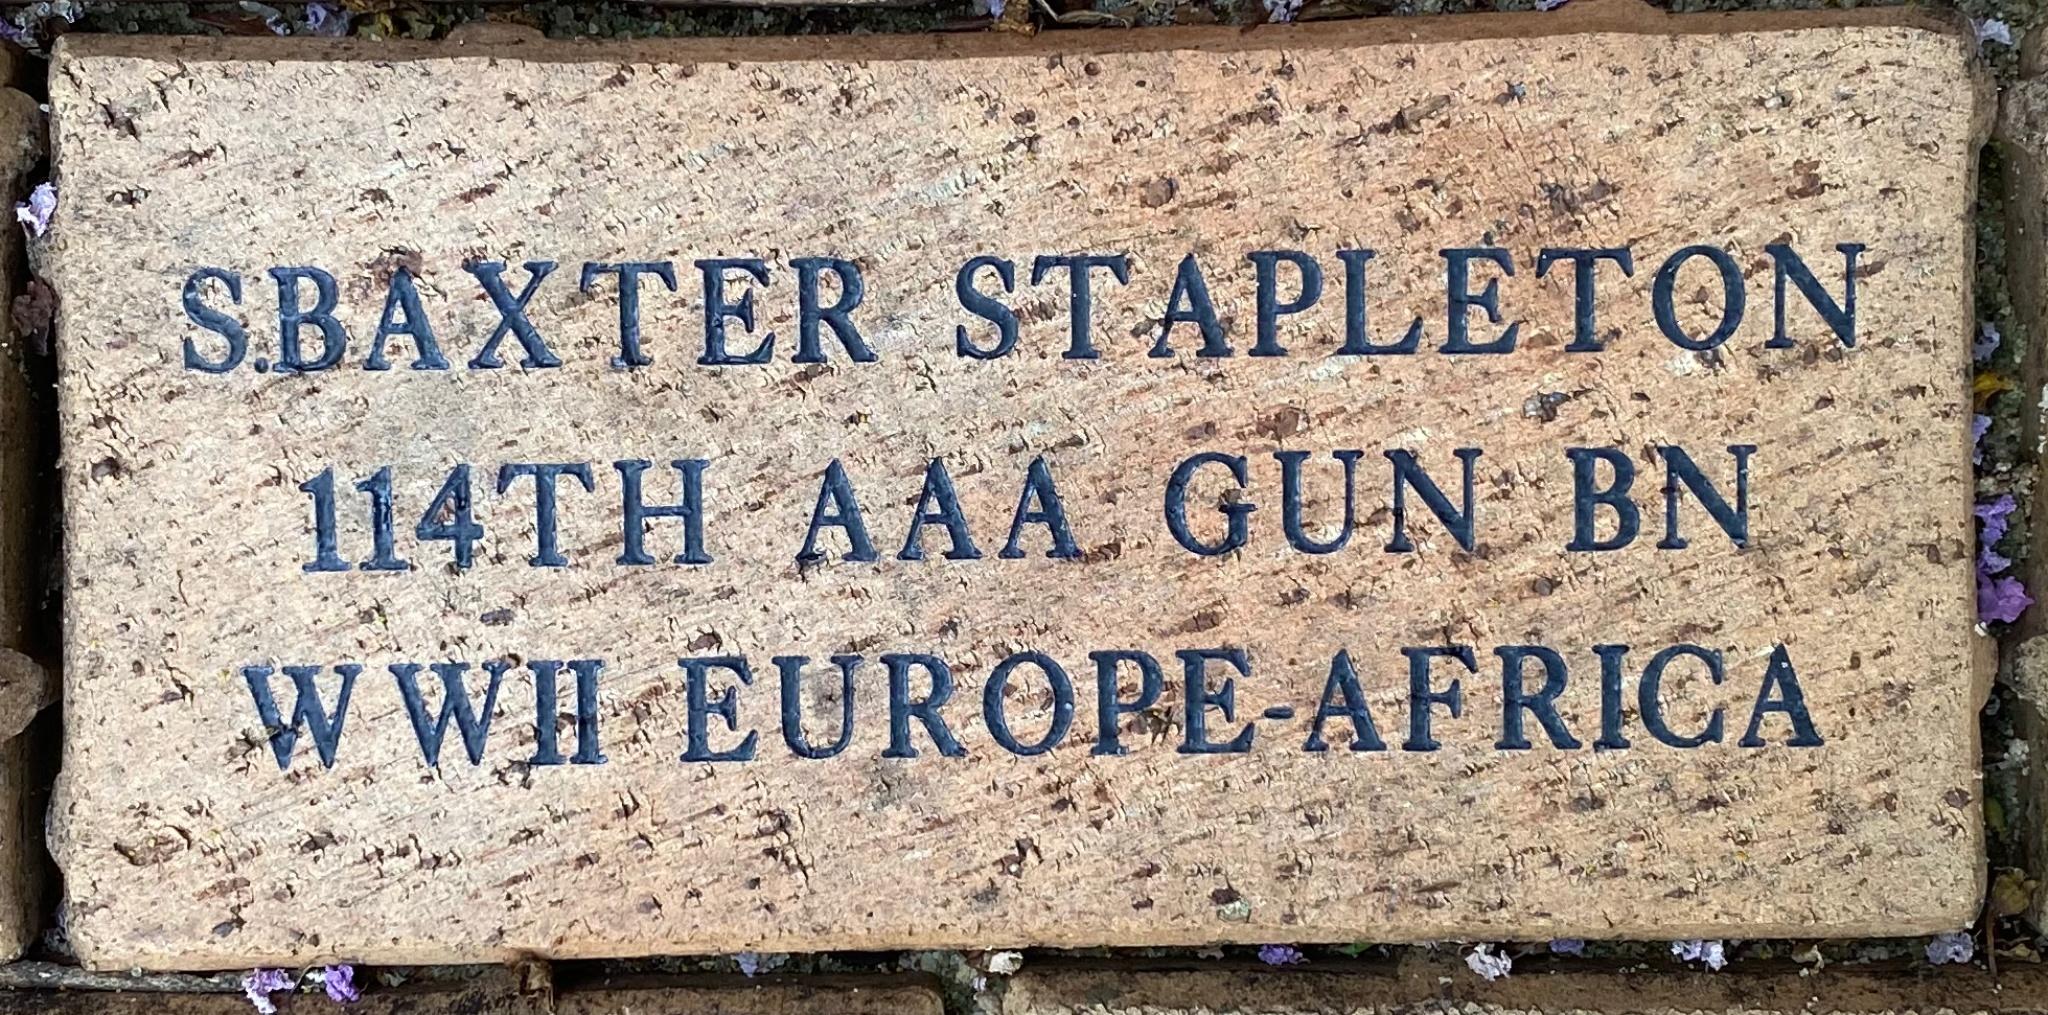 S.BAXTER STAPLETON 114TH AAA GUN BN WWII EUROPE-NAFRICA